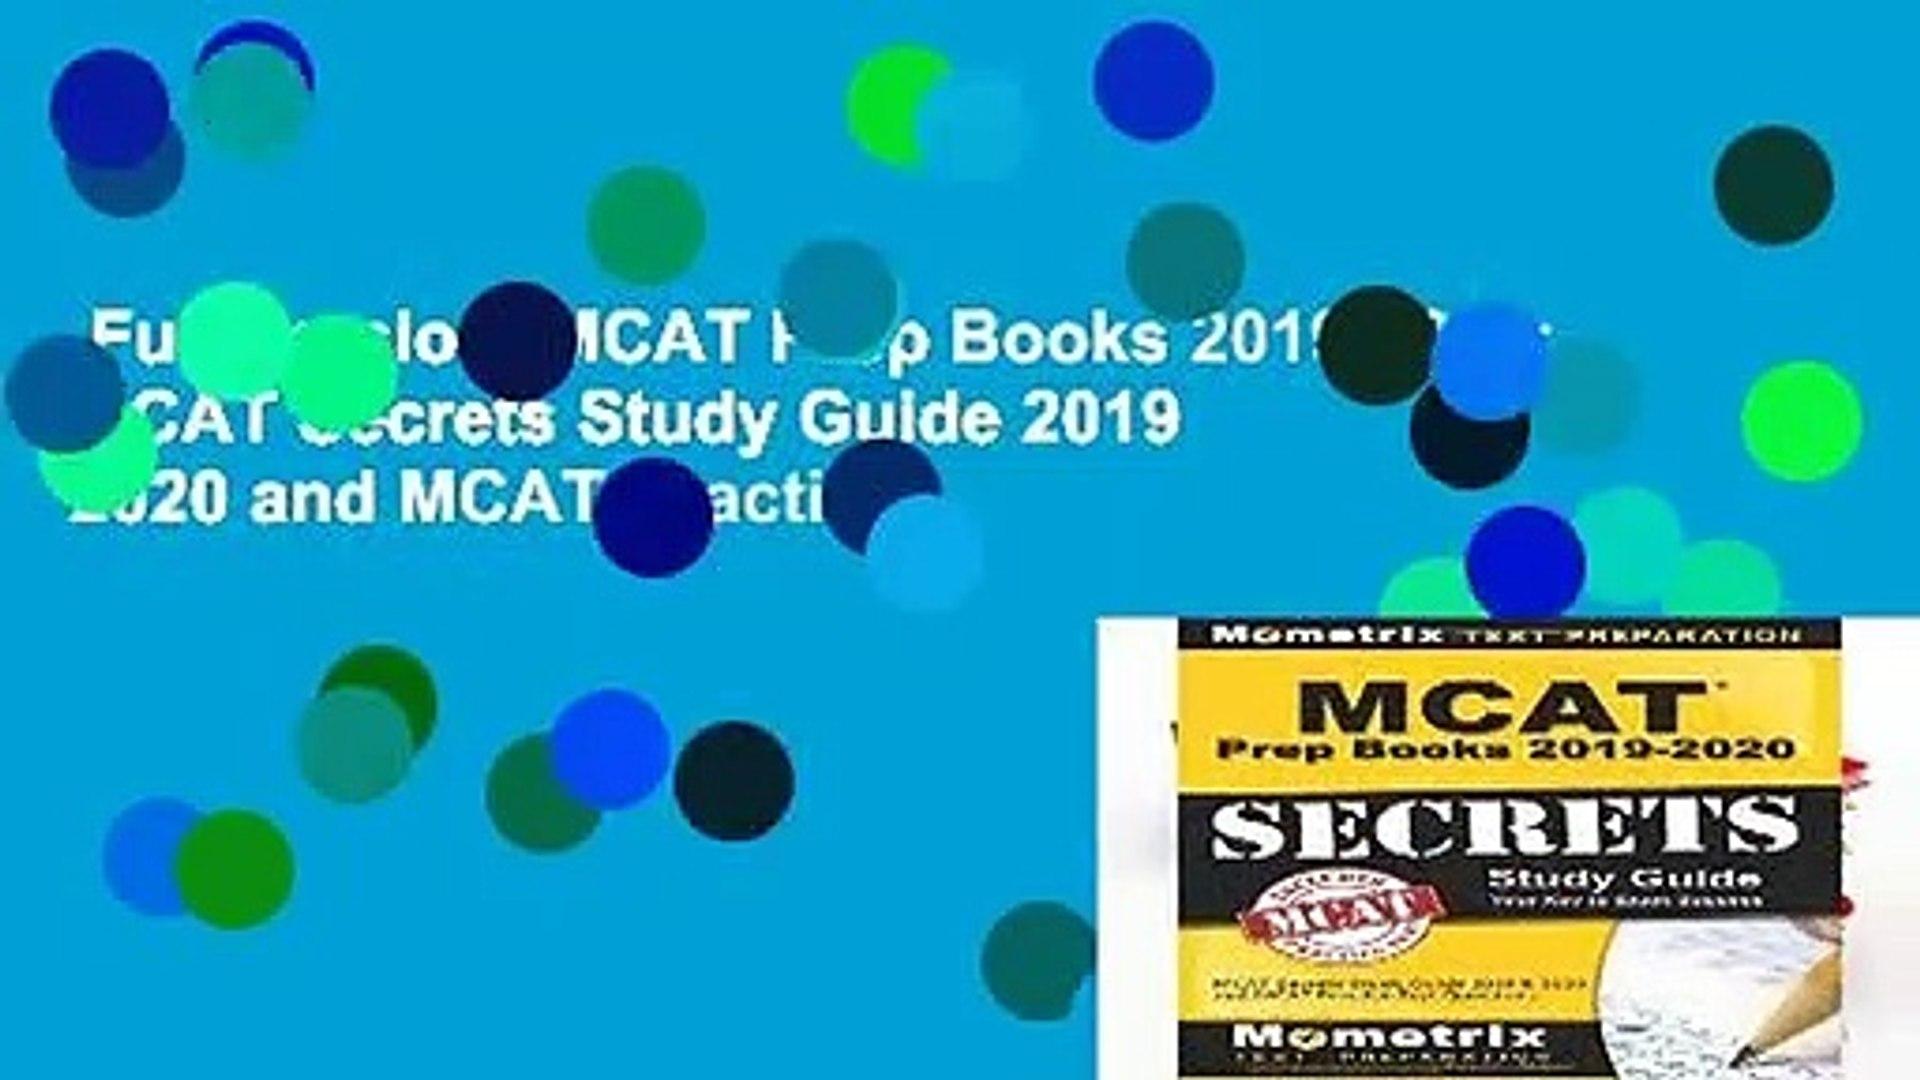 Full Version  MCAT Prep Books 2019-2020: MCAT Secrets Study Guide 2019   2020 and MCAT Practice